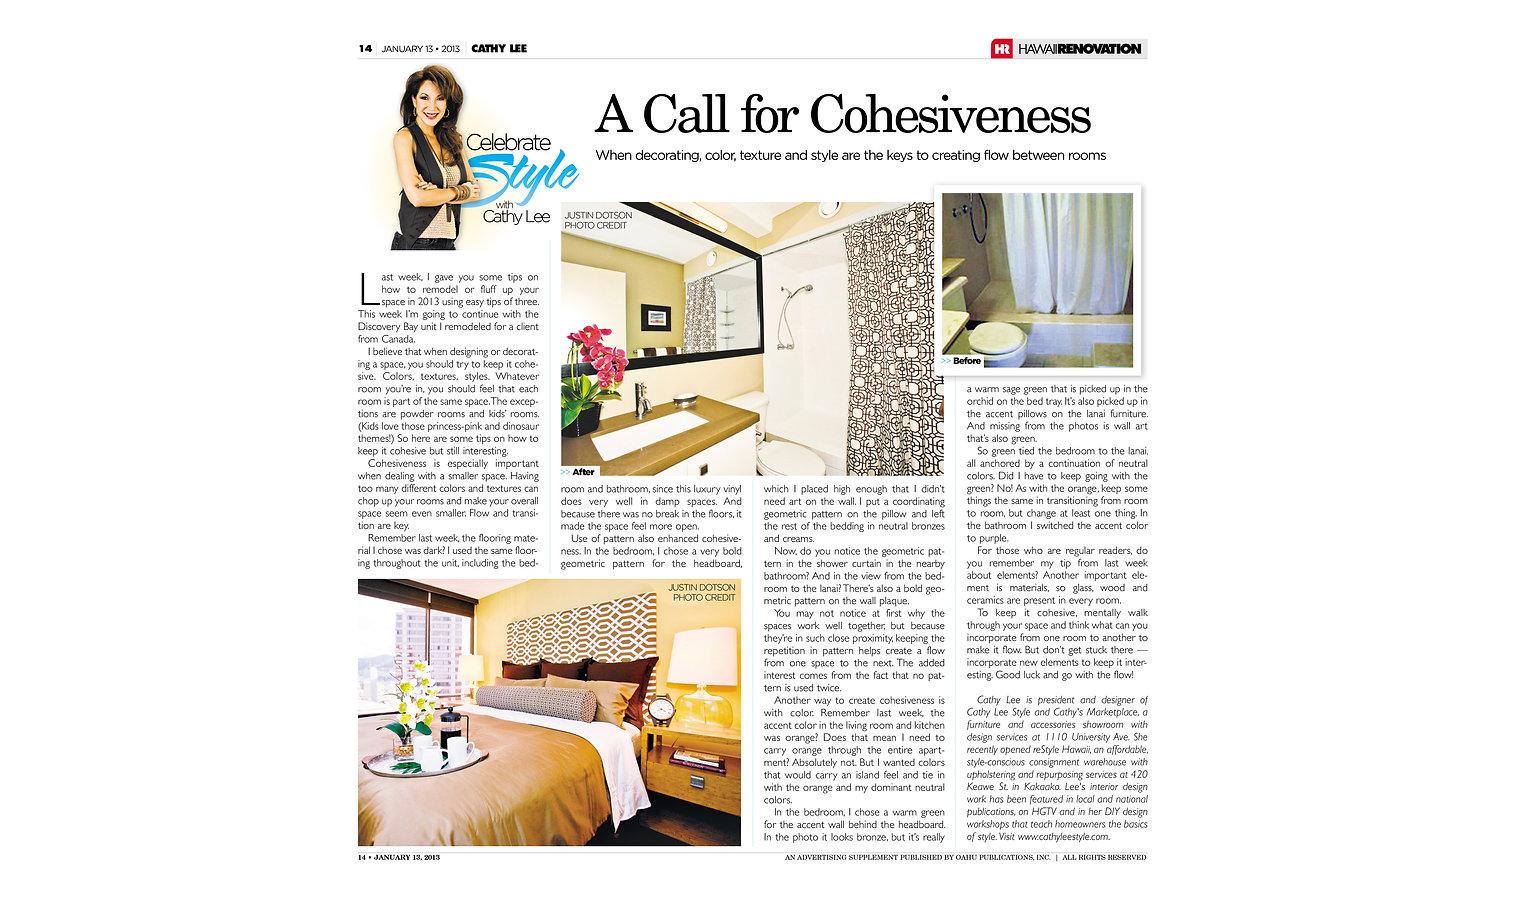 Call for Cohesiveness_01_13_2013.jpg